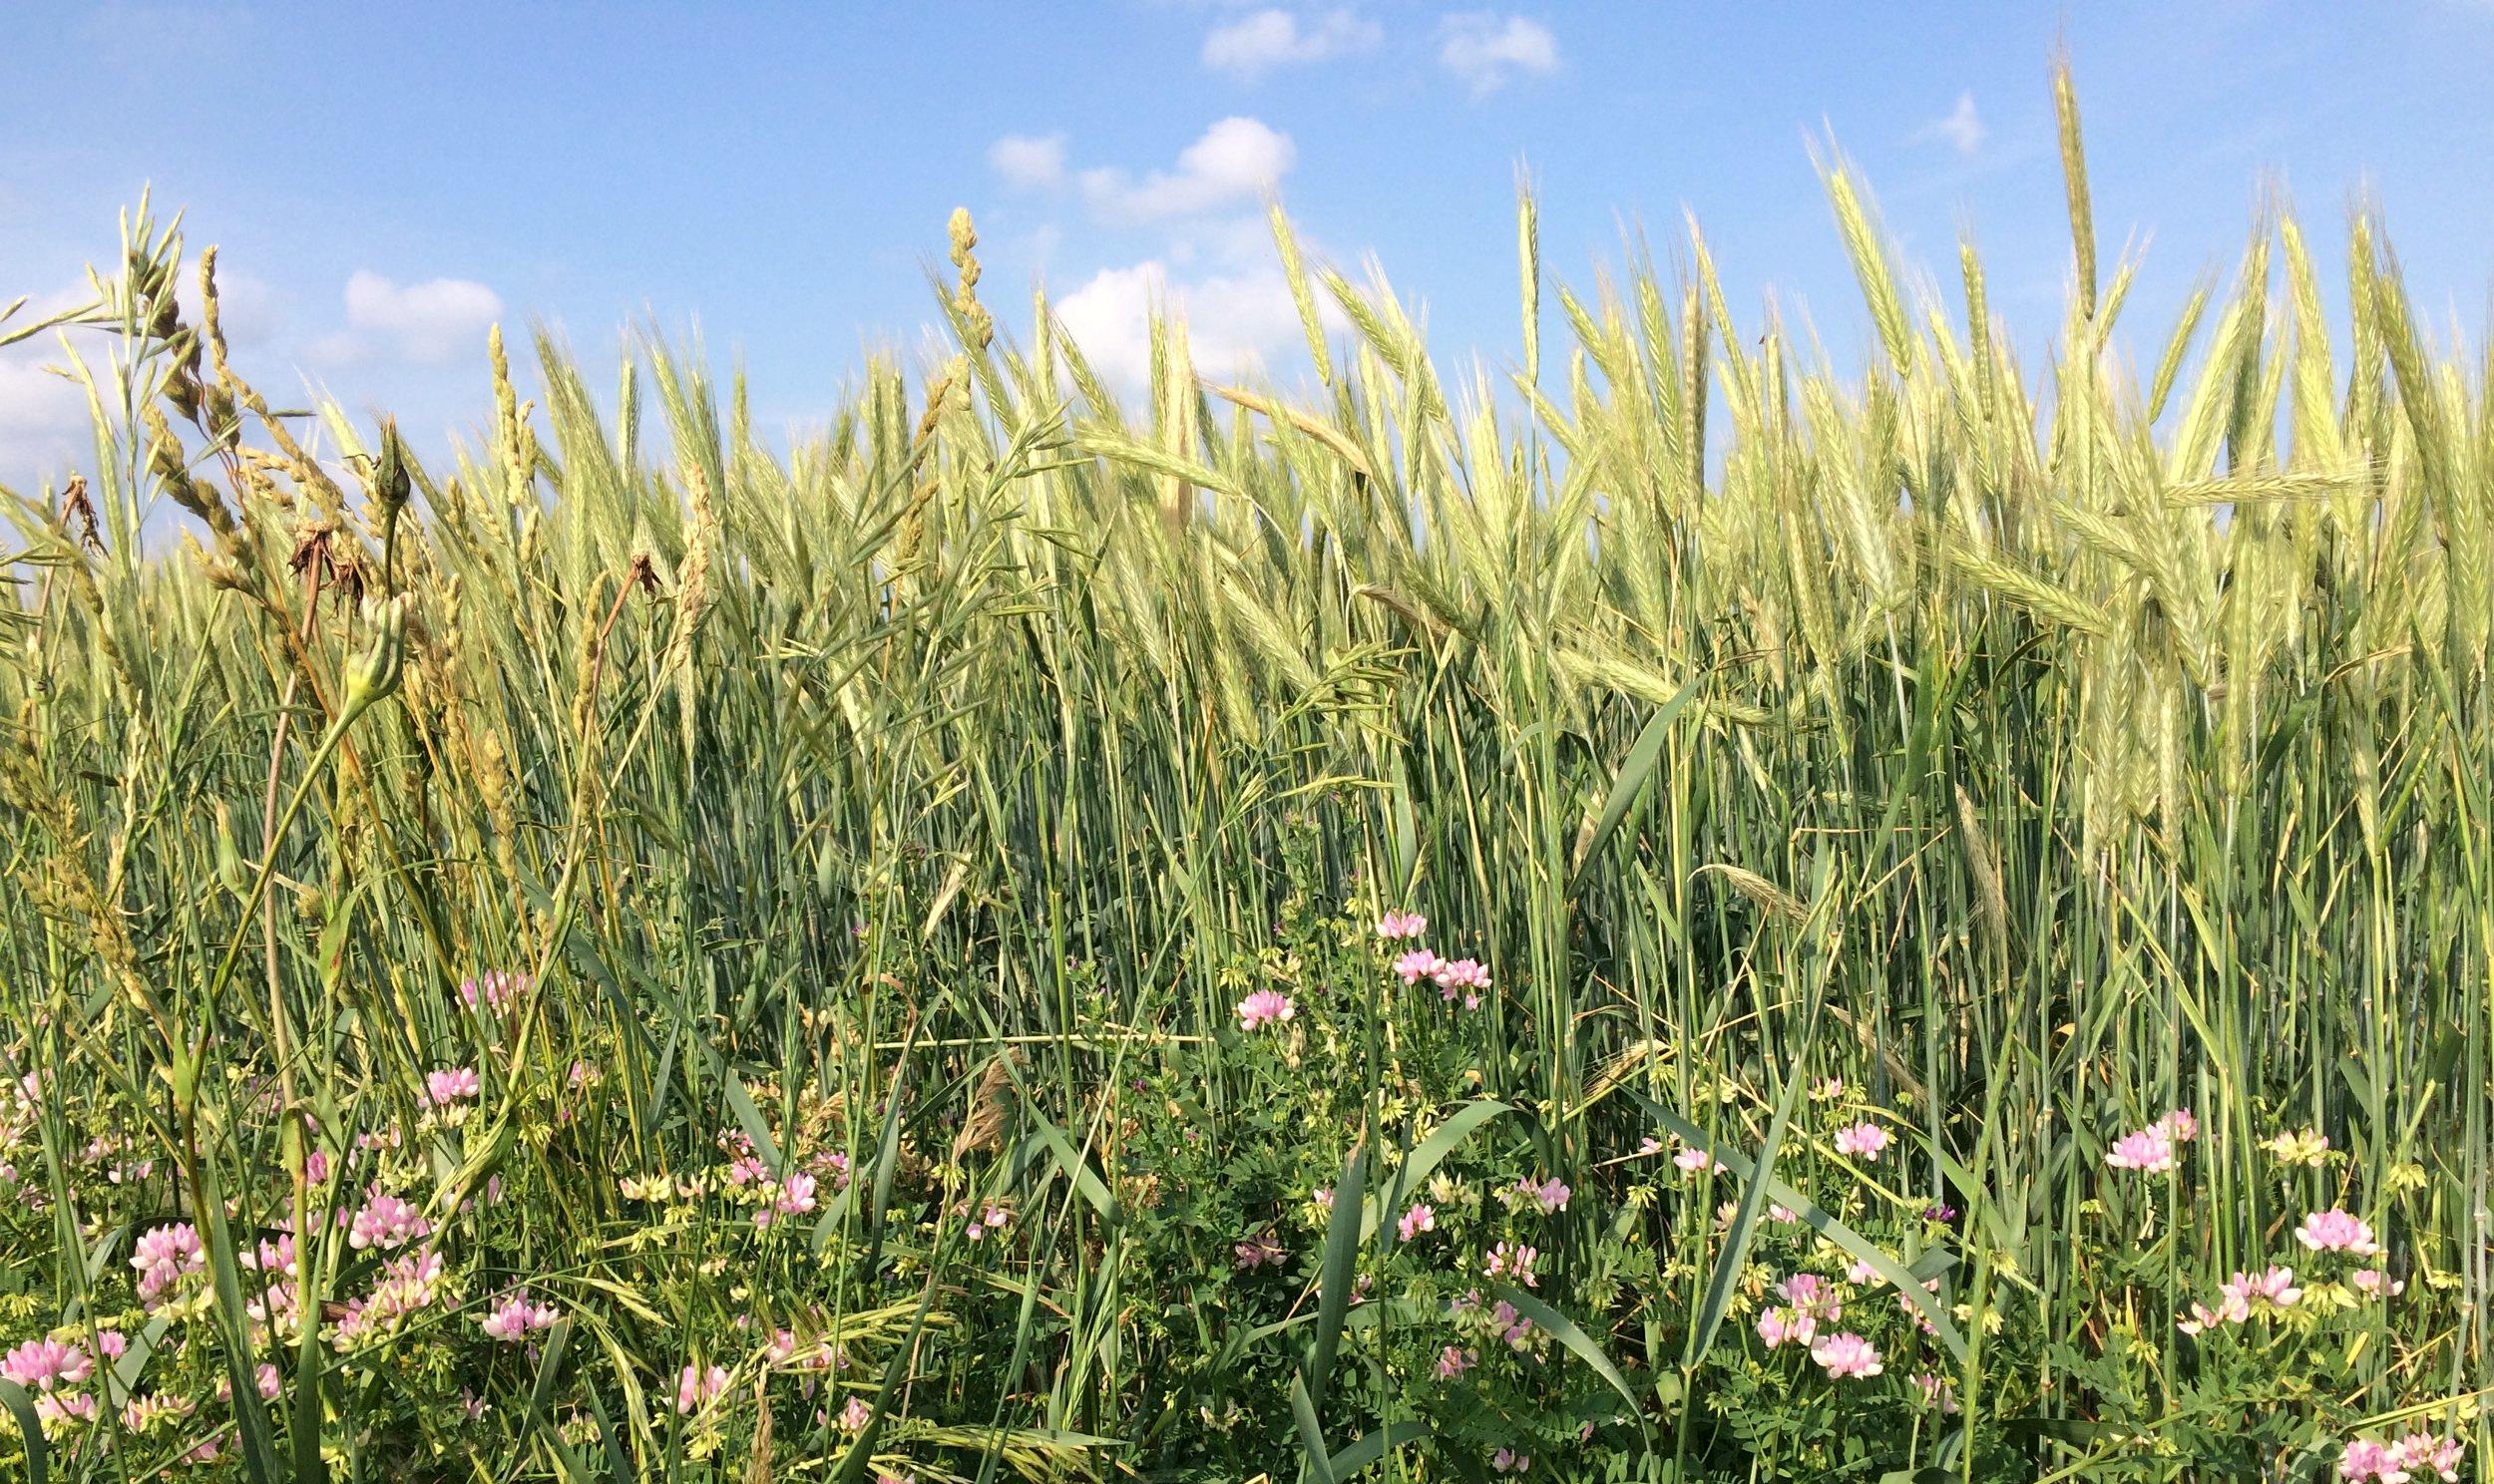 Our organic rye waves in the early June breeze. We grow heirloom Danko rye, as well as the hybrid Barsetto rye.